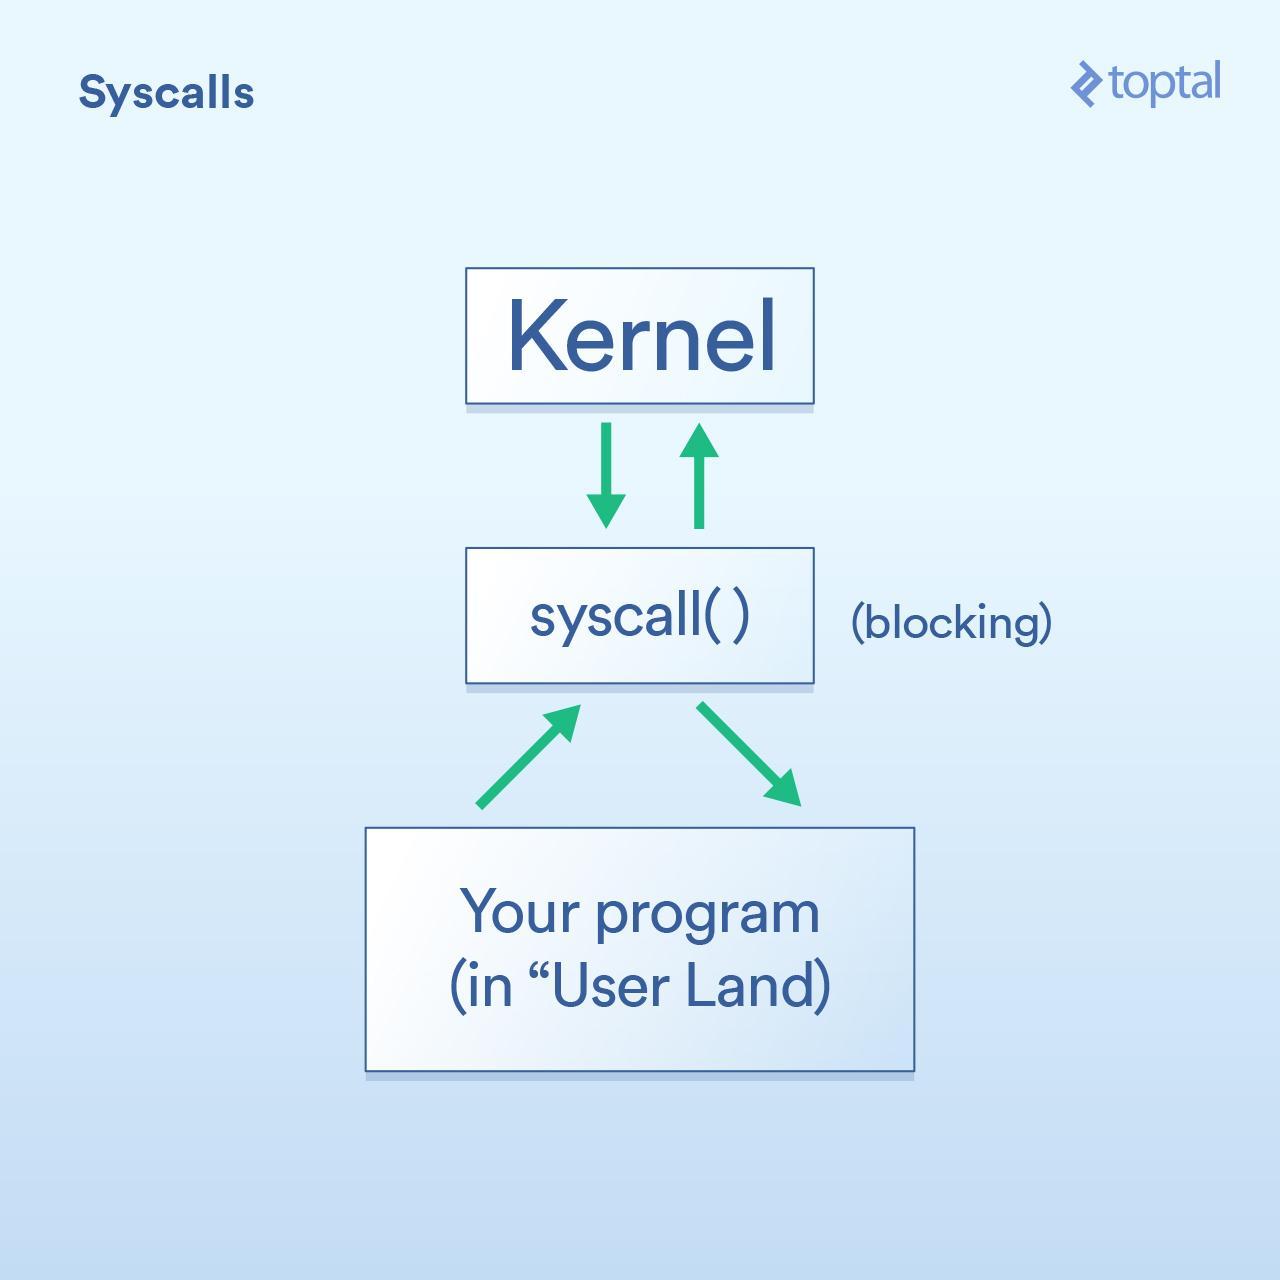 Syscalls Diagram